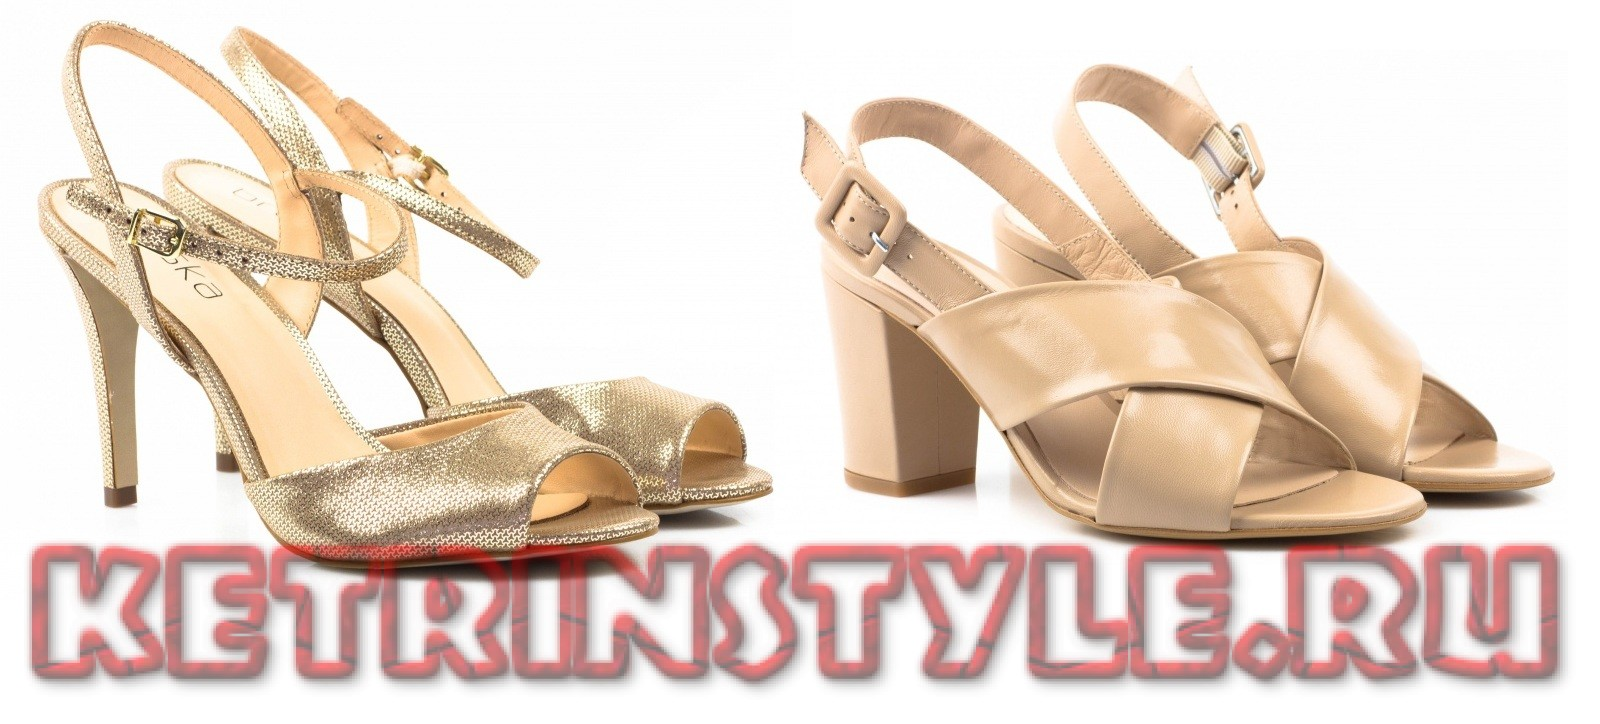 de4d9b241a83e Strieborné sandále Giambattista valli podporuje všeobecný trend na  metalíze, Alexander McQueen kombinuje zakrivené päty s platformou, Gucci  zdobí to hrotmi, ...